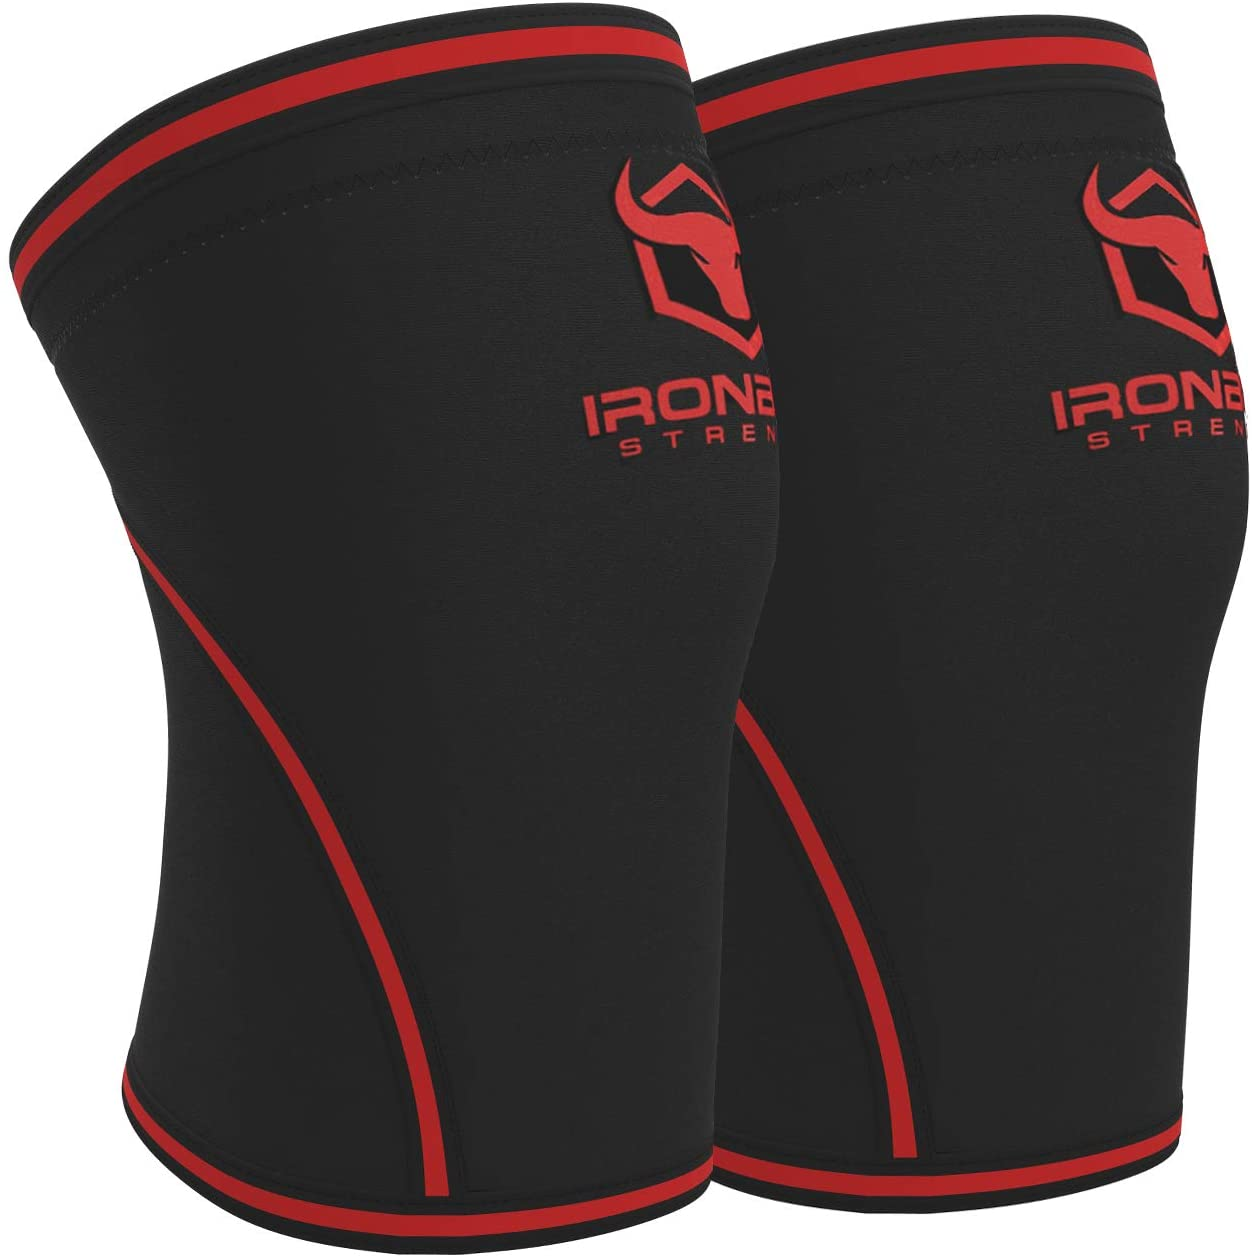 Iron Bull Strength Knee Sleeves 7mm (1 Pair)